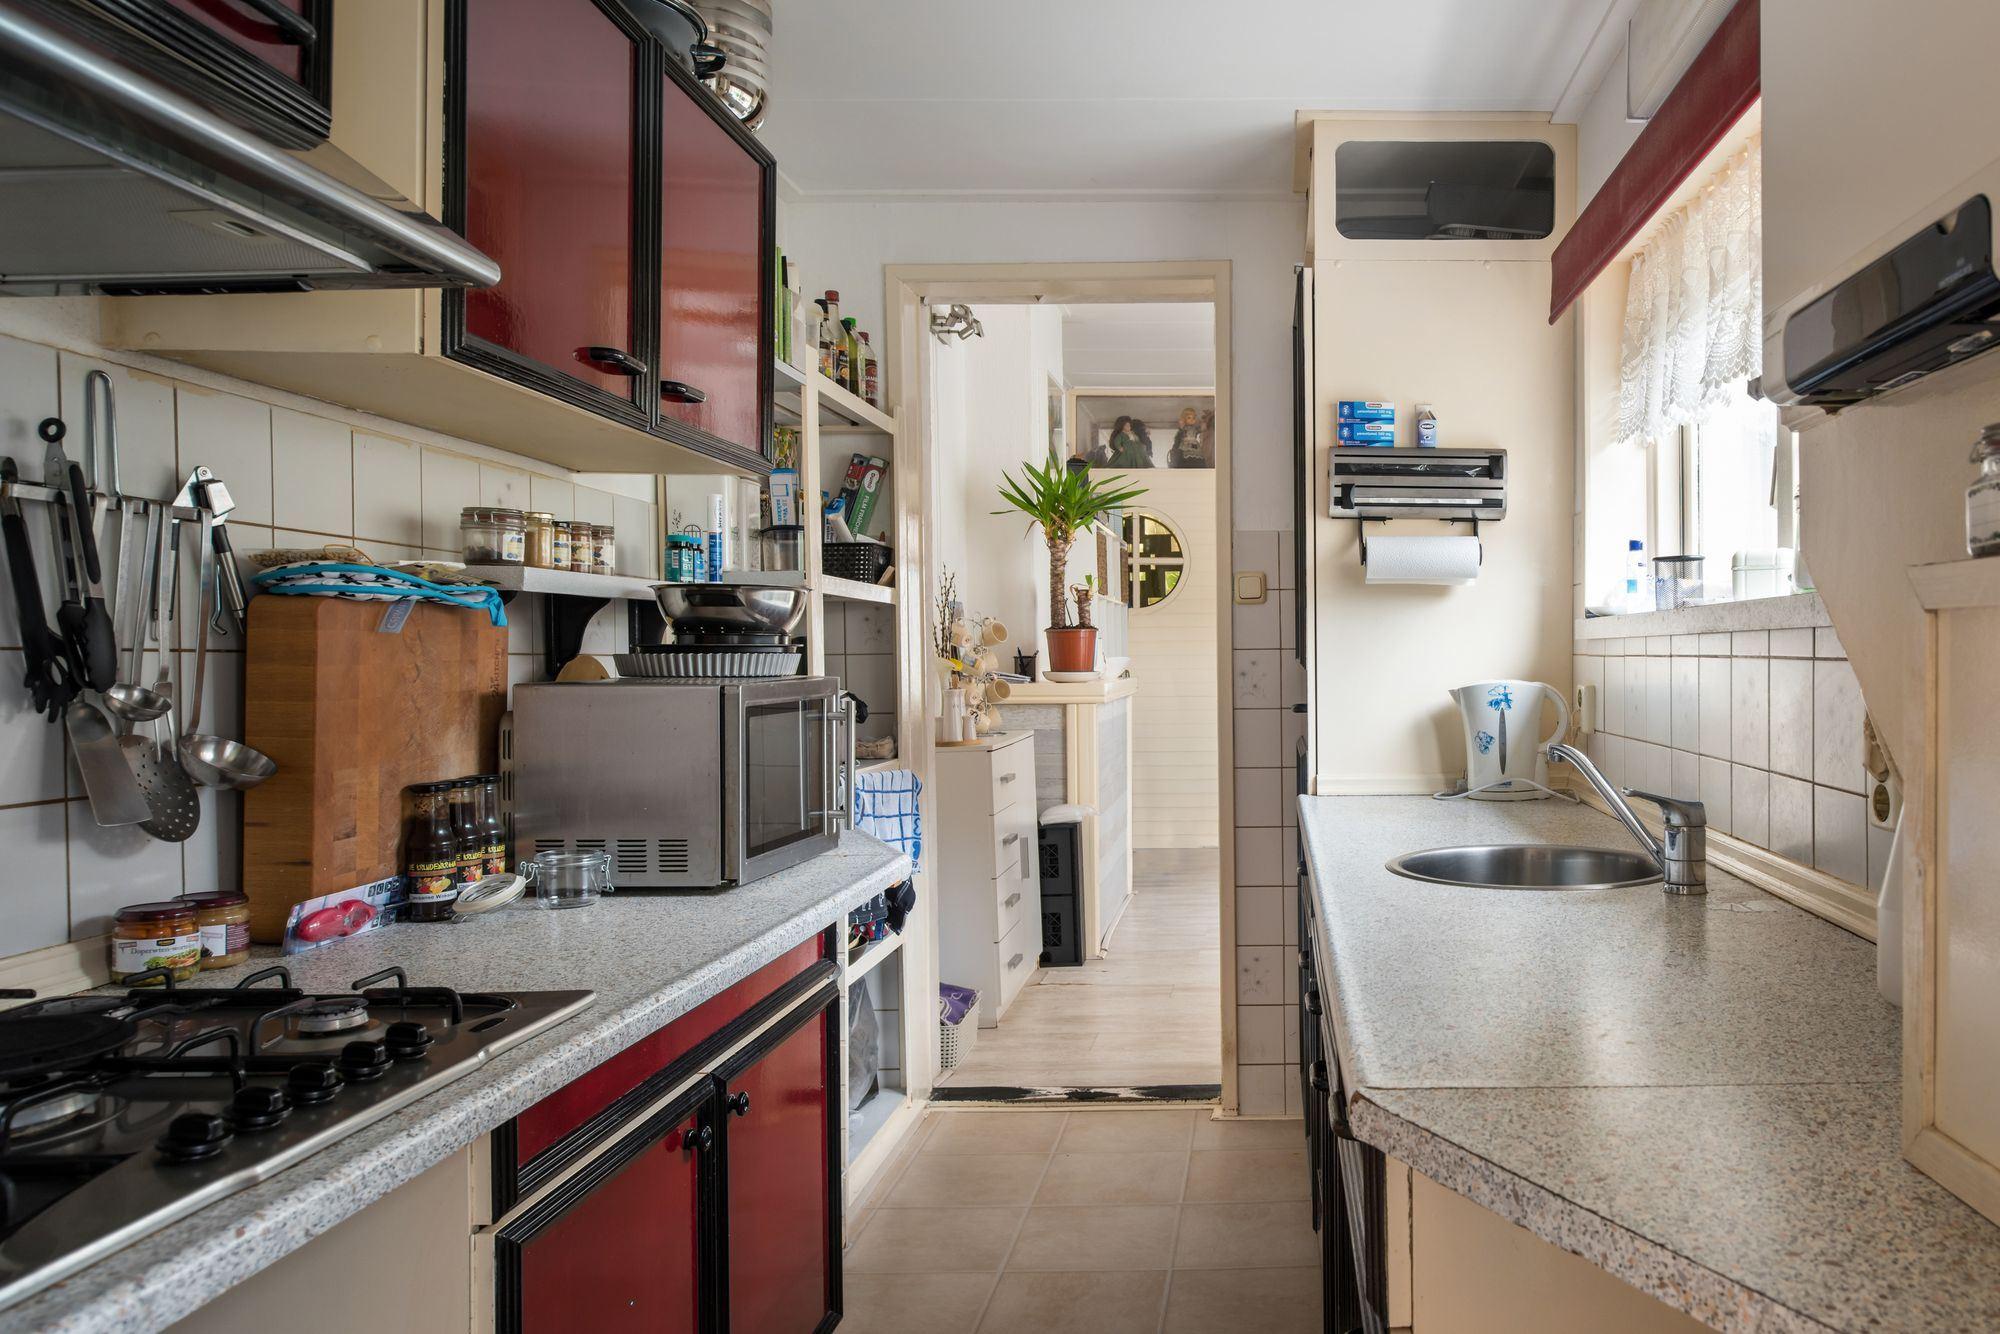 Verkocht dubbele regel 9 8441 an heerenveen funda for Funda dubbele bewoning